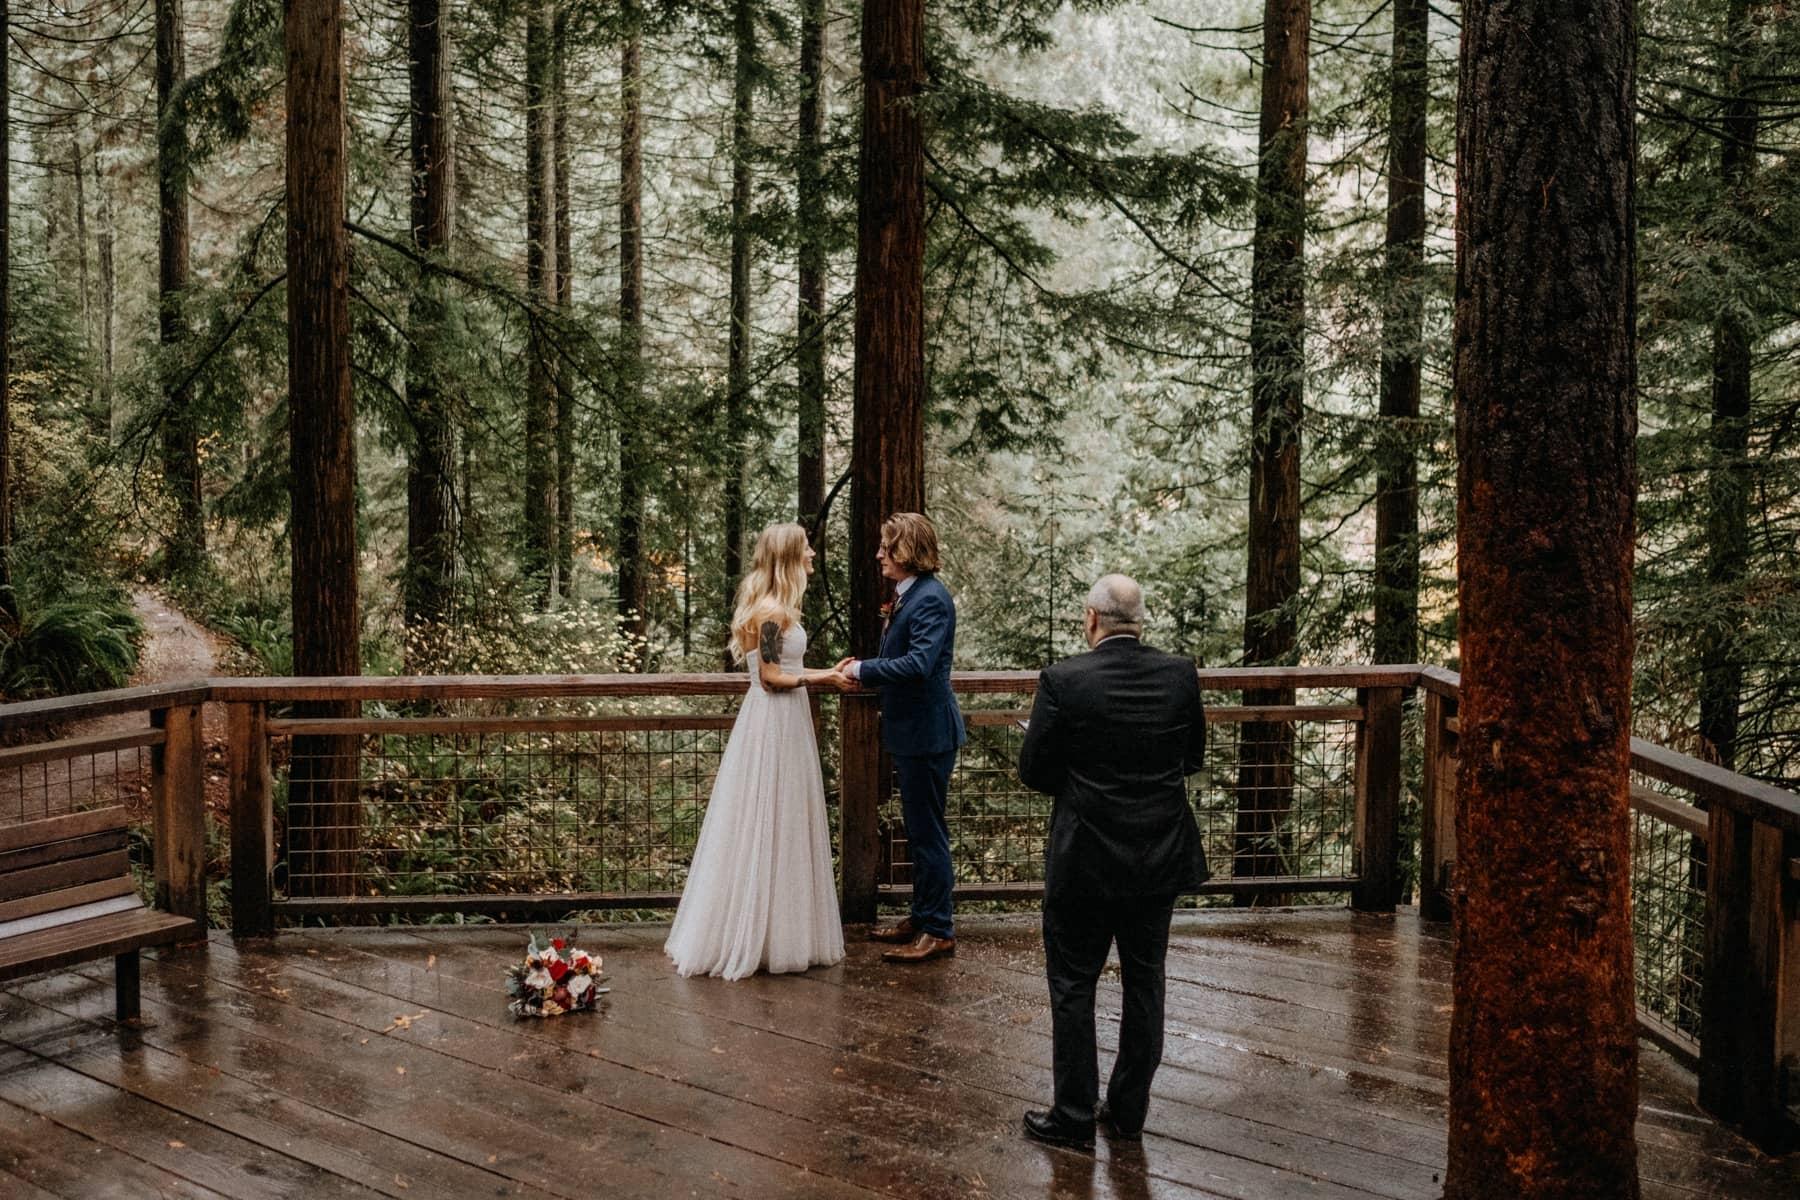 redwood deck wedding venue in portland oregon